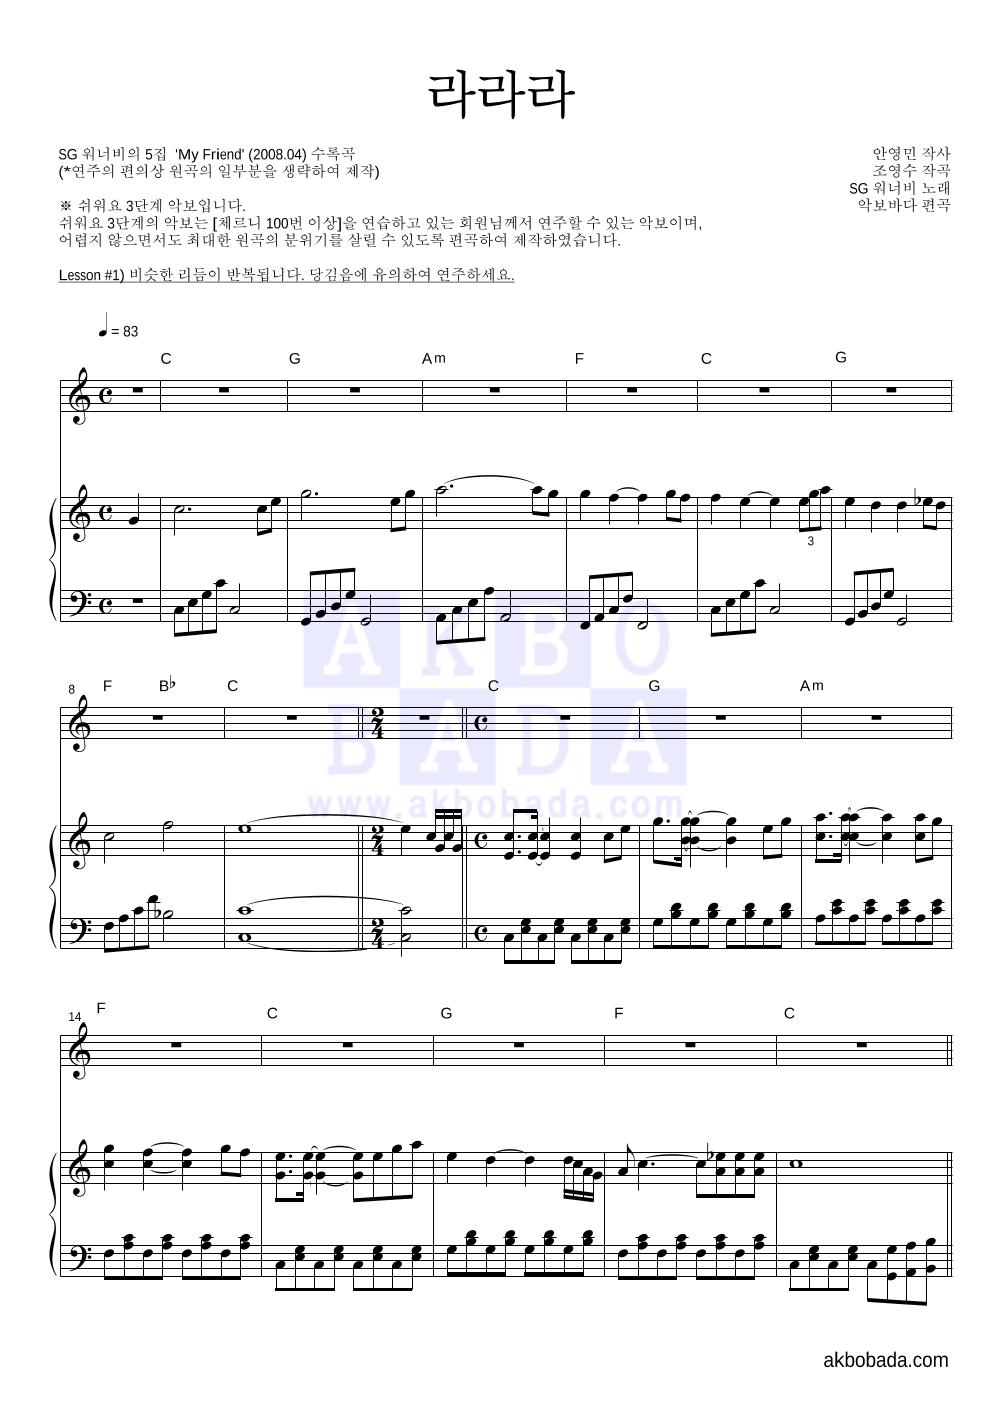 SG워너비 - 라라라 피아노3단-쉬워요 악보